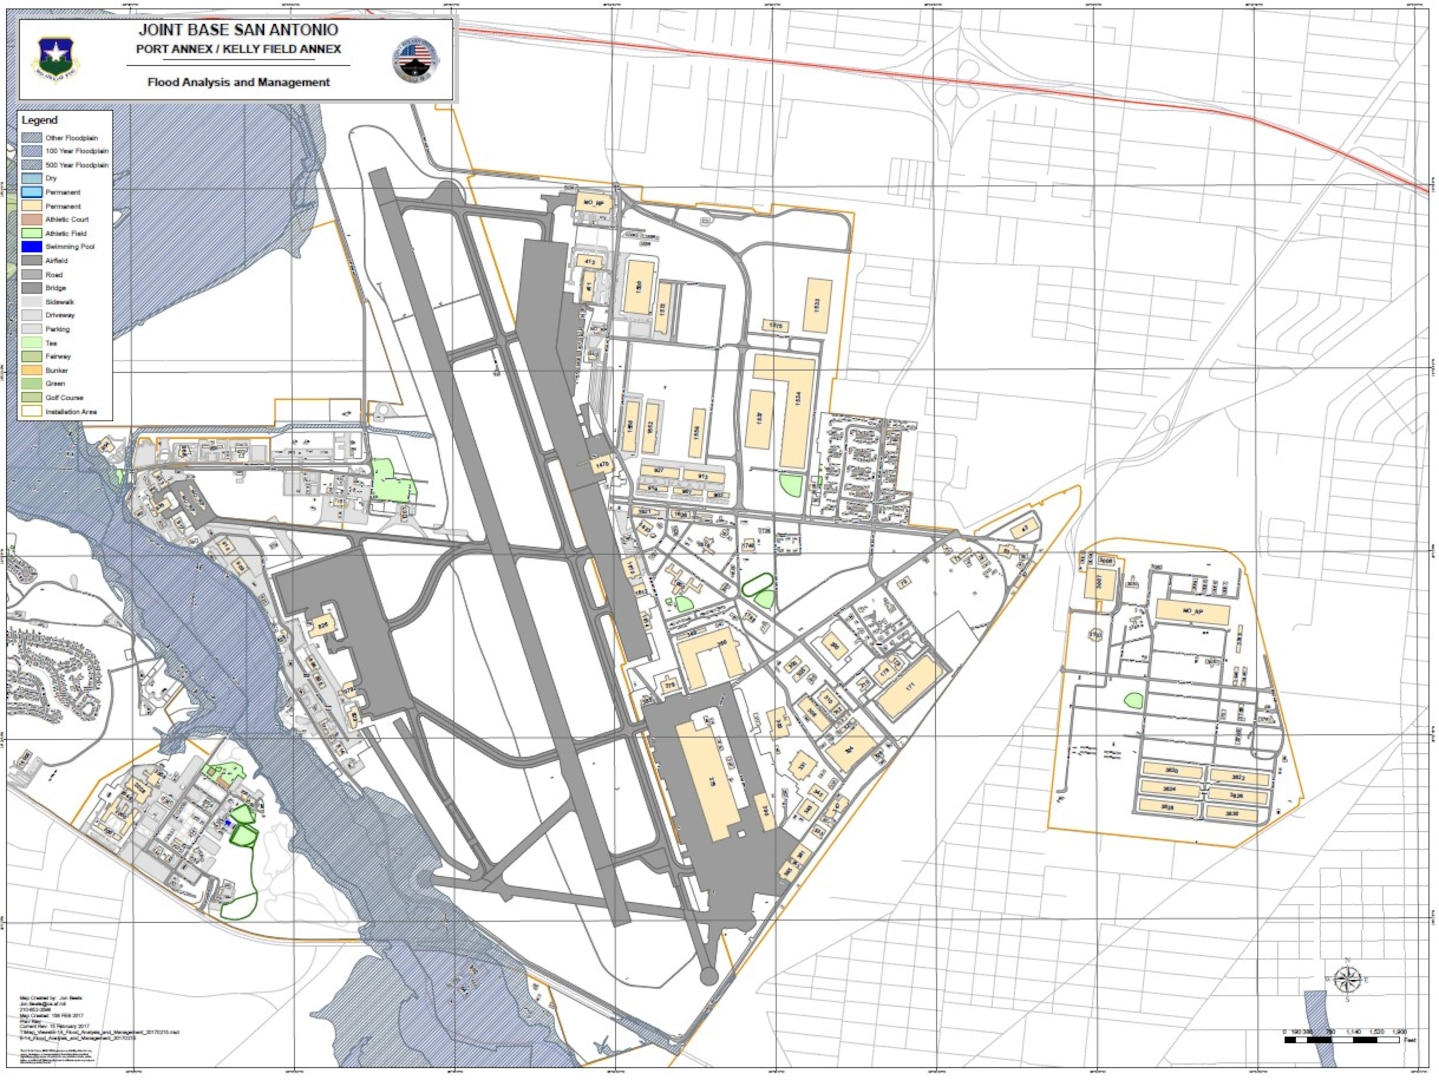 Joint Base San Antonio-Kelly Field Annex flood map.